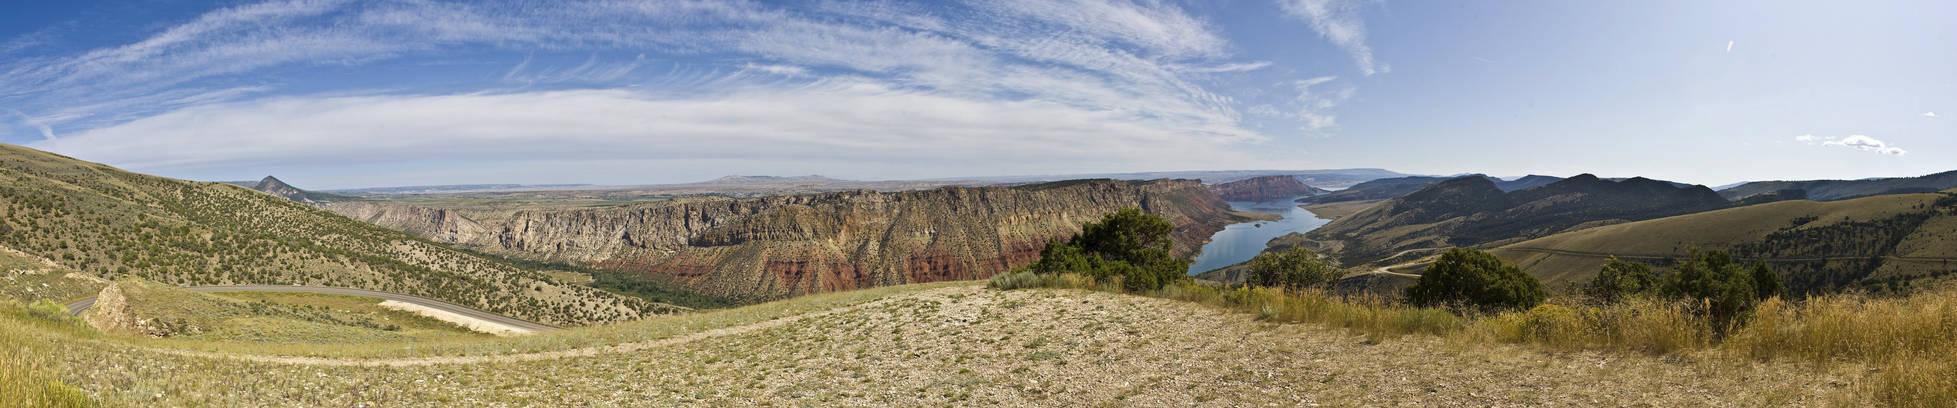 somewhere panorama